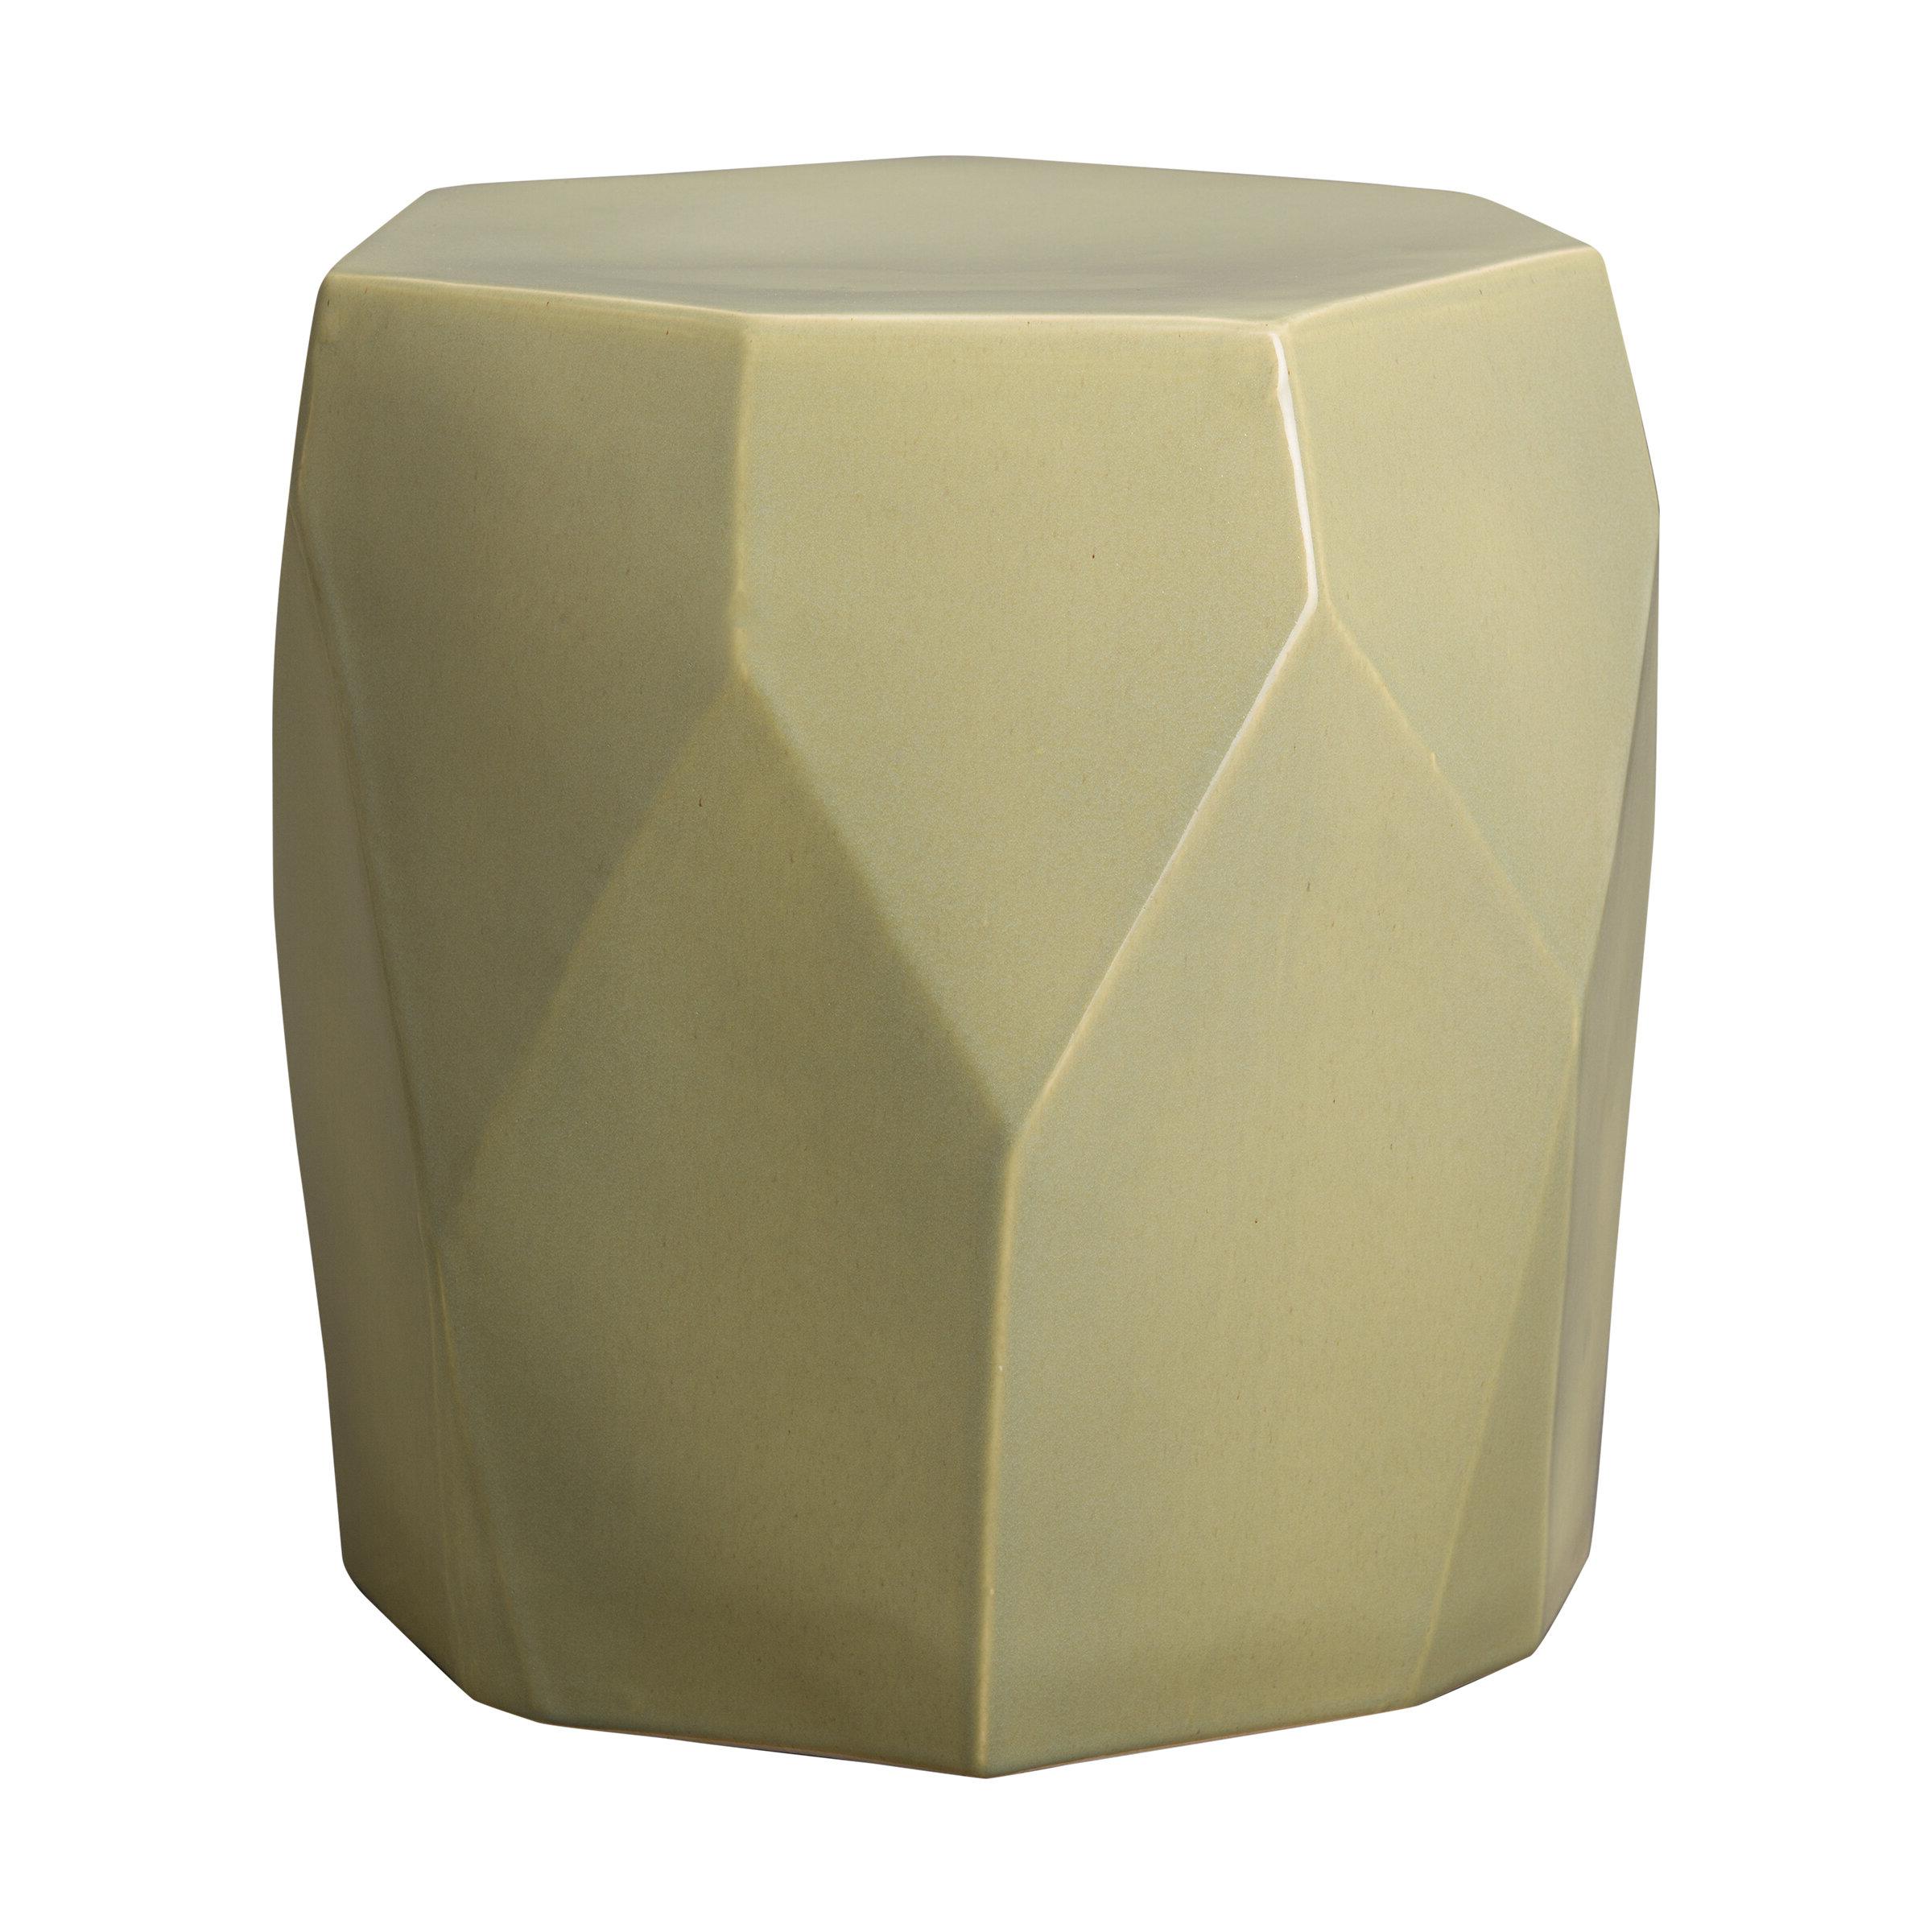 Nadelman Facet Garden Stool For Fashionable Jadiel Ceramic Garden Stools (View 14 of 30)